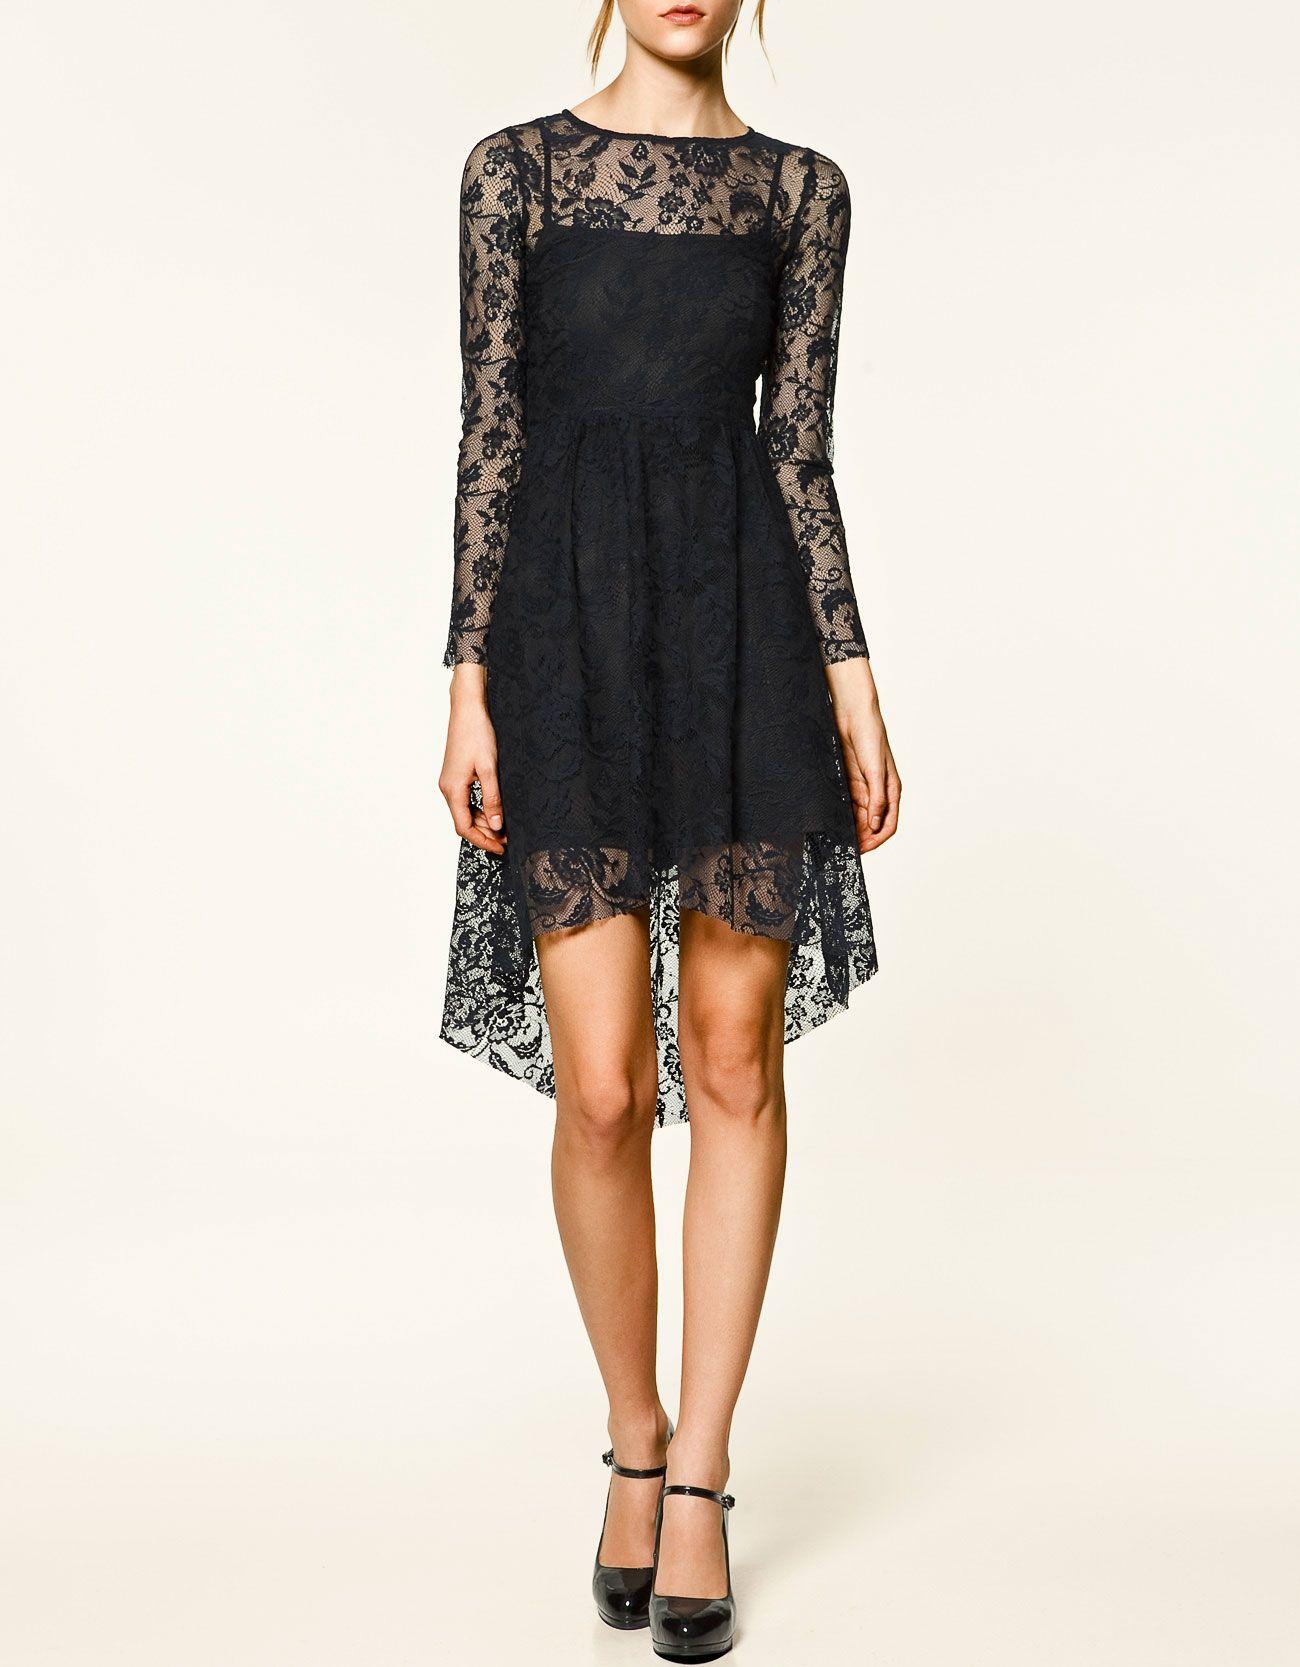 White lace dress zara  So pretty and chic and ladylike  My Style  Pinterest  Lace dress